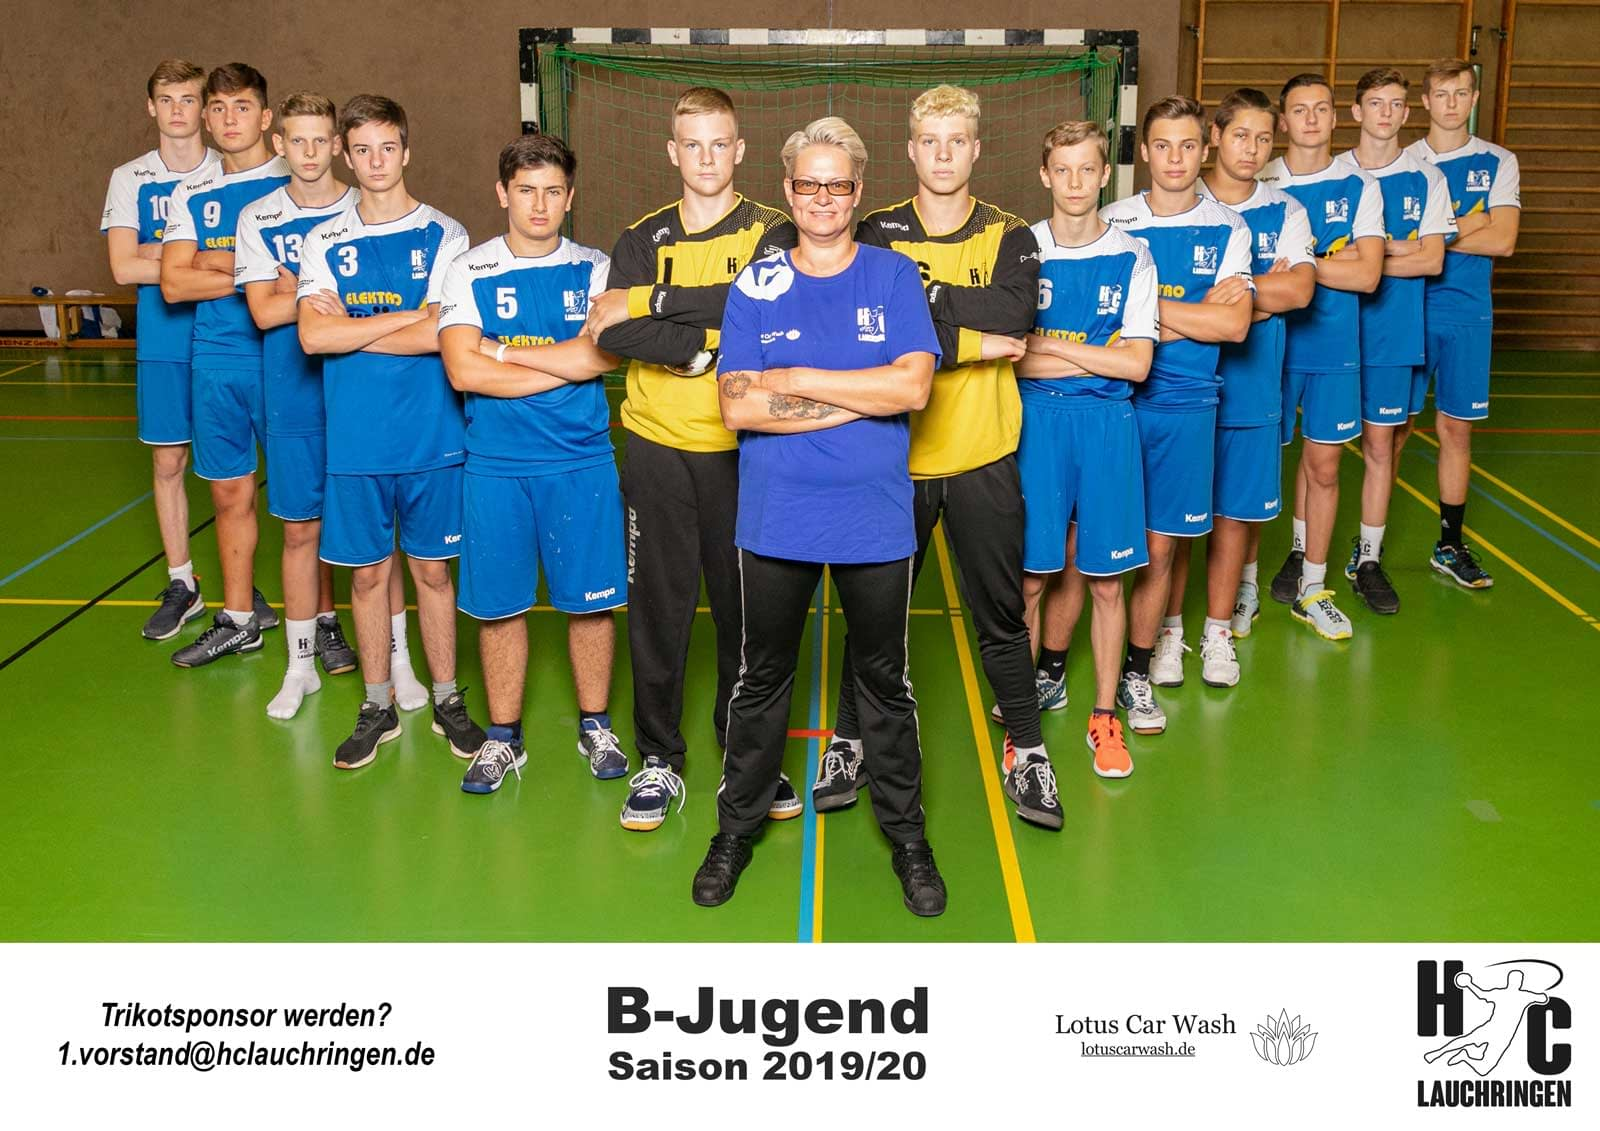 B-Jugend männlich HC Lauchringen